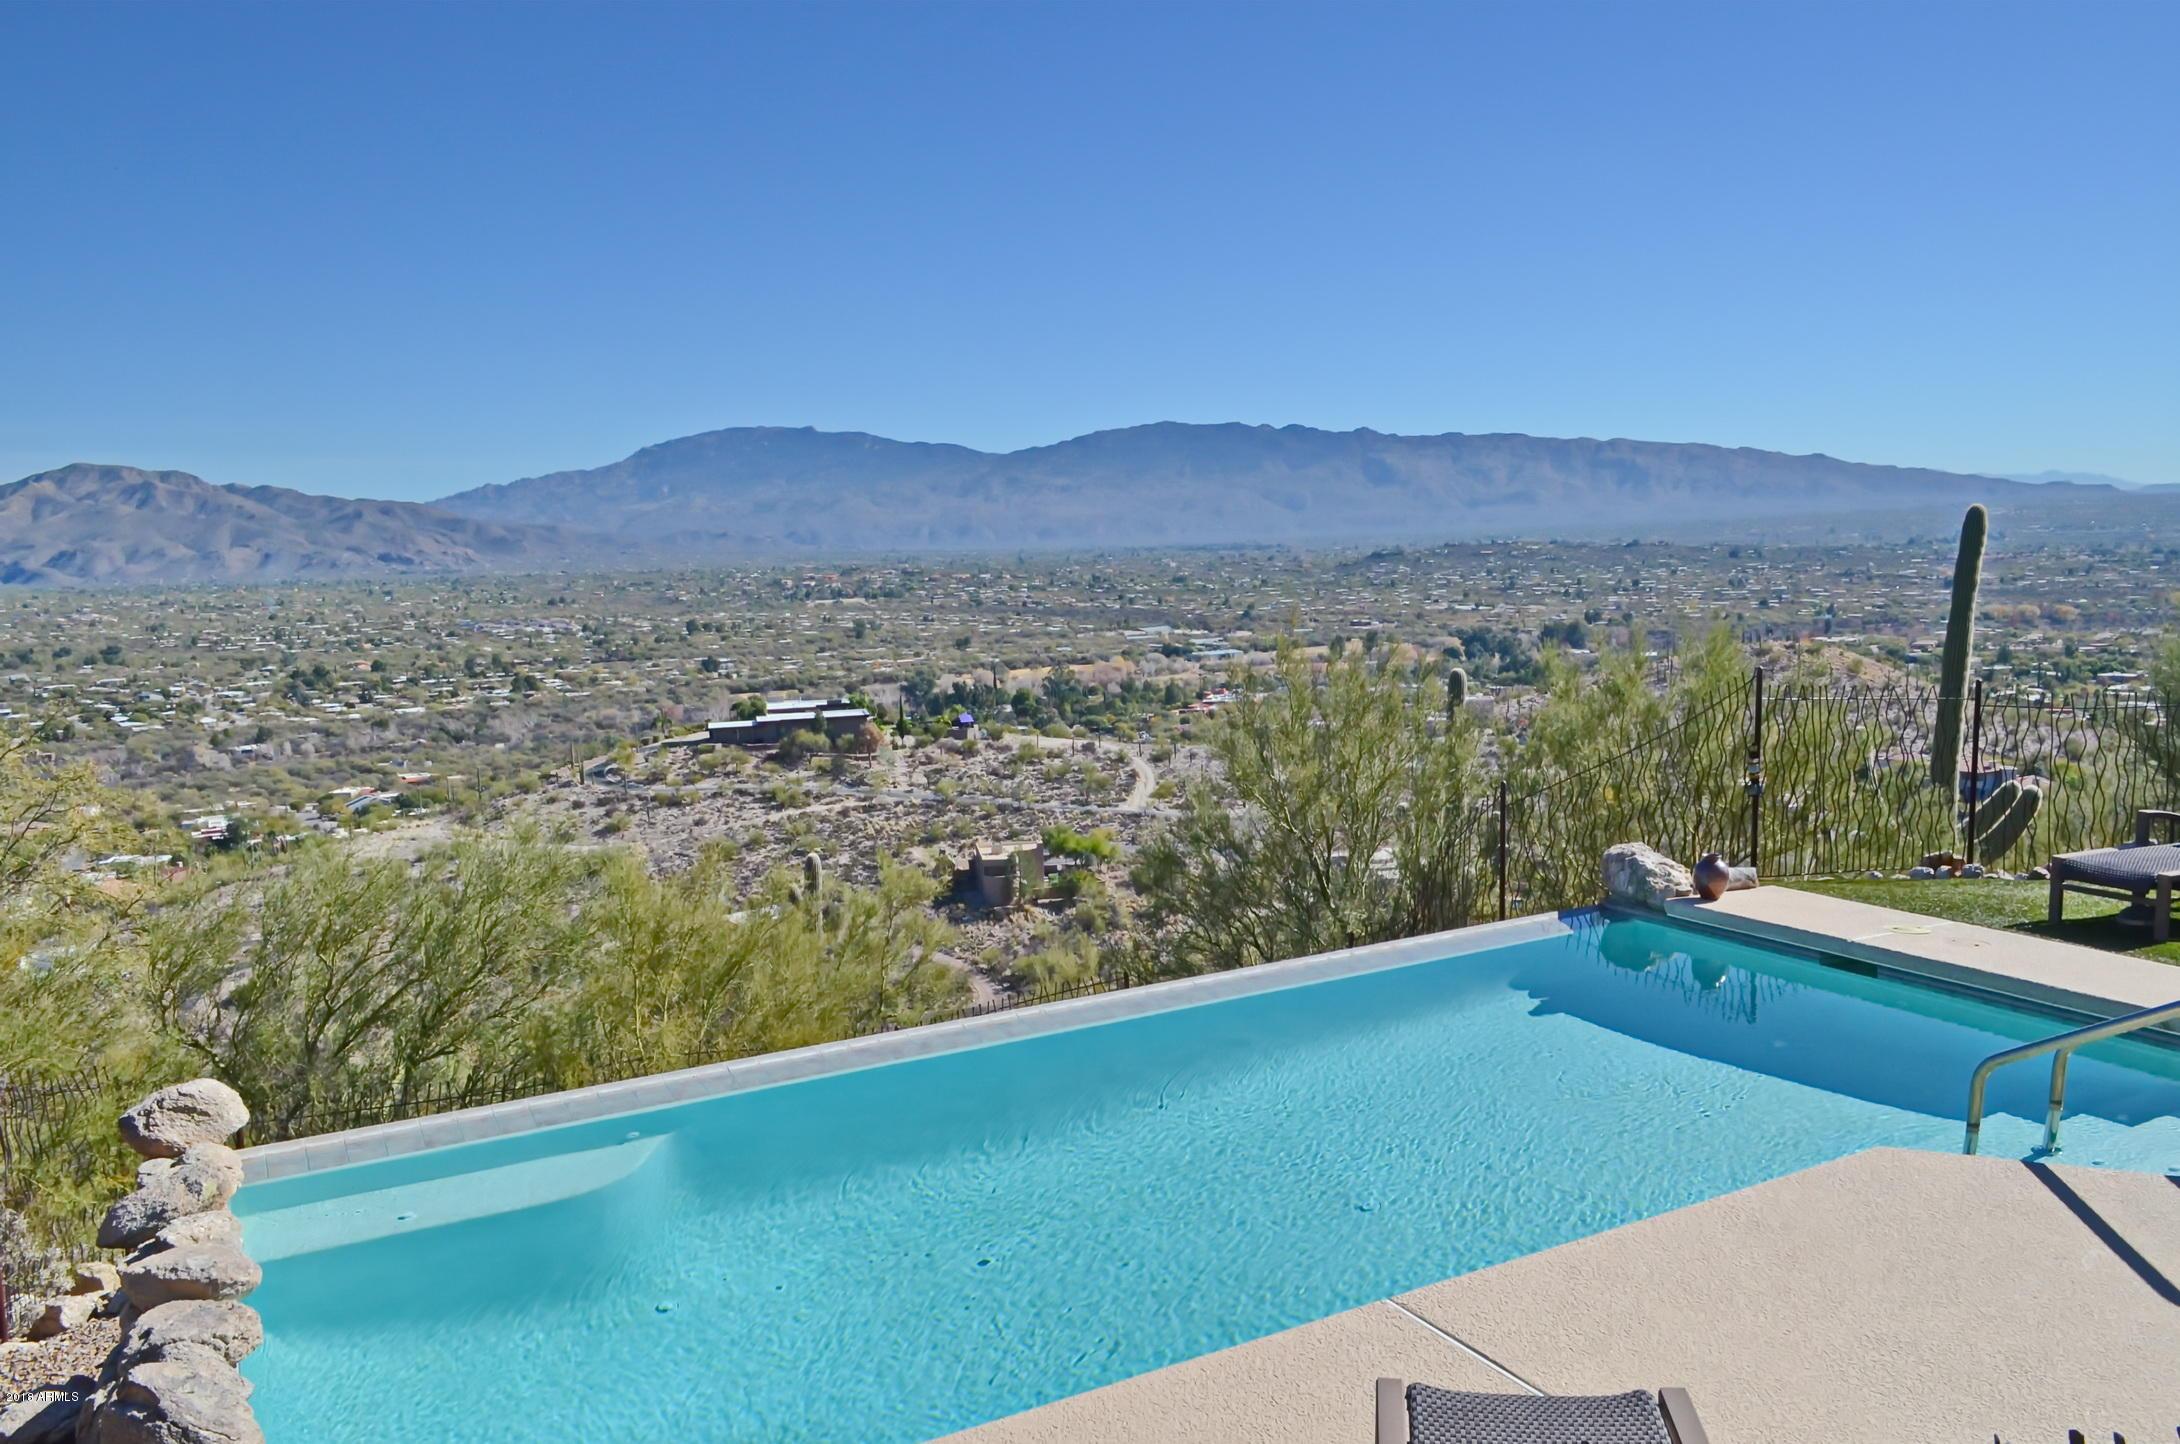 MLS 5713968 4550 N QUARTZ HILL Place, Tucson, AZ Tucson AZ Gated Scenic